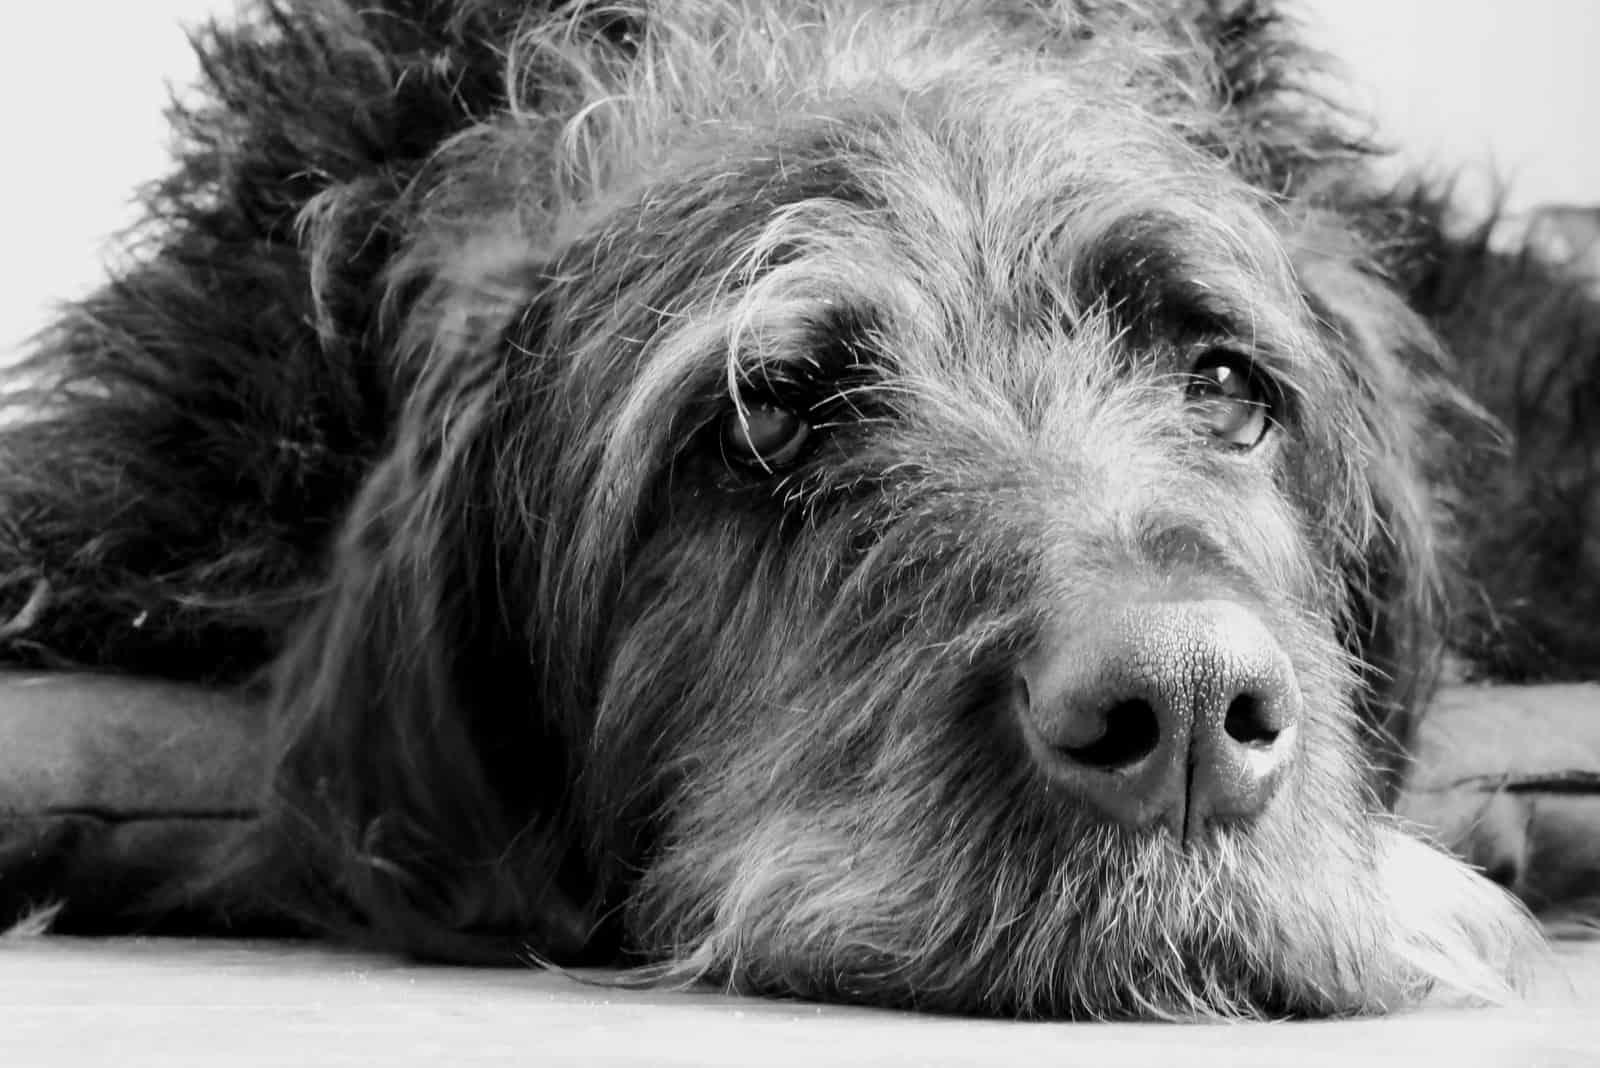 a sad-looking dog lies